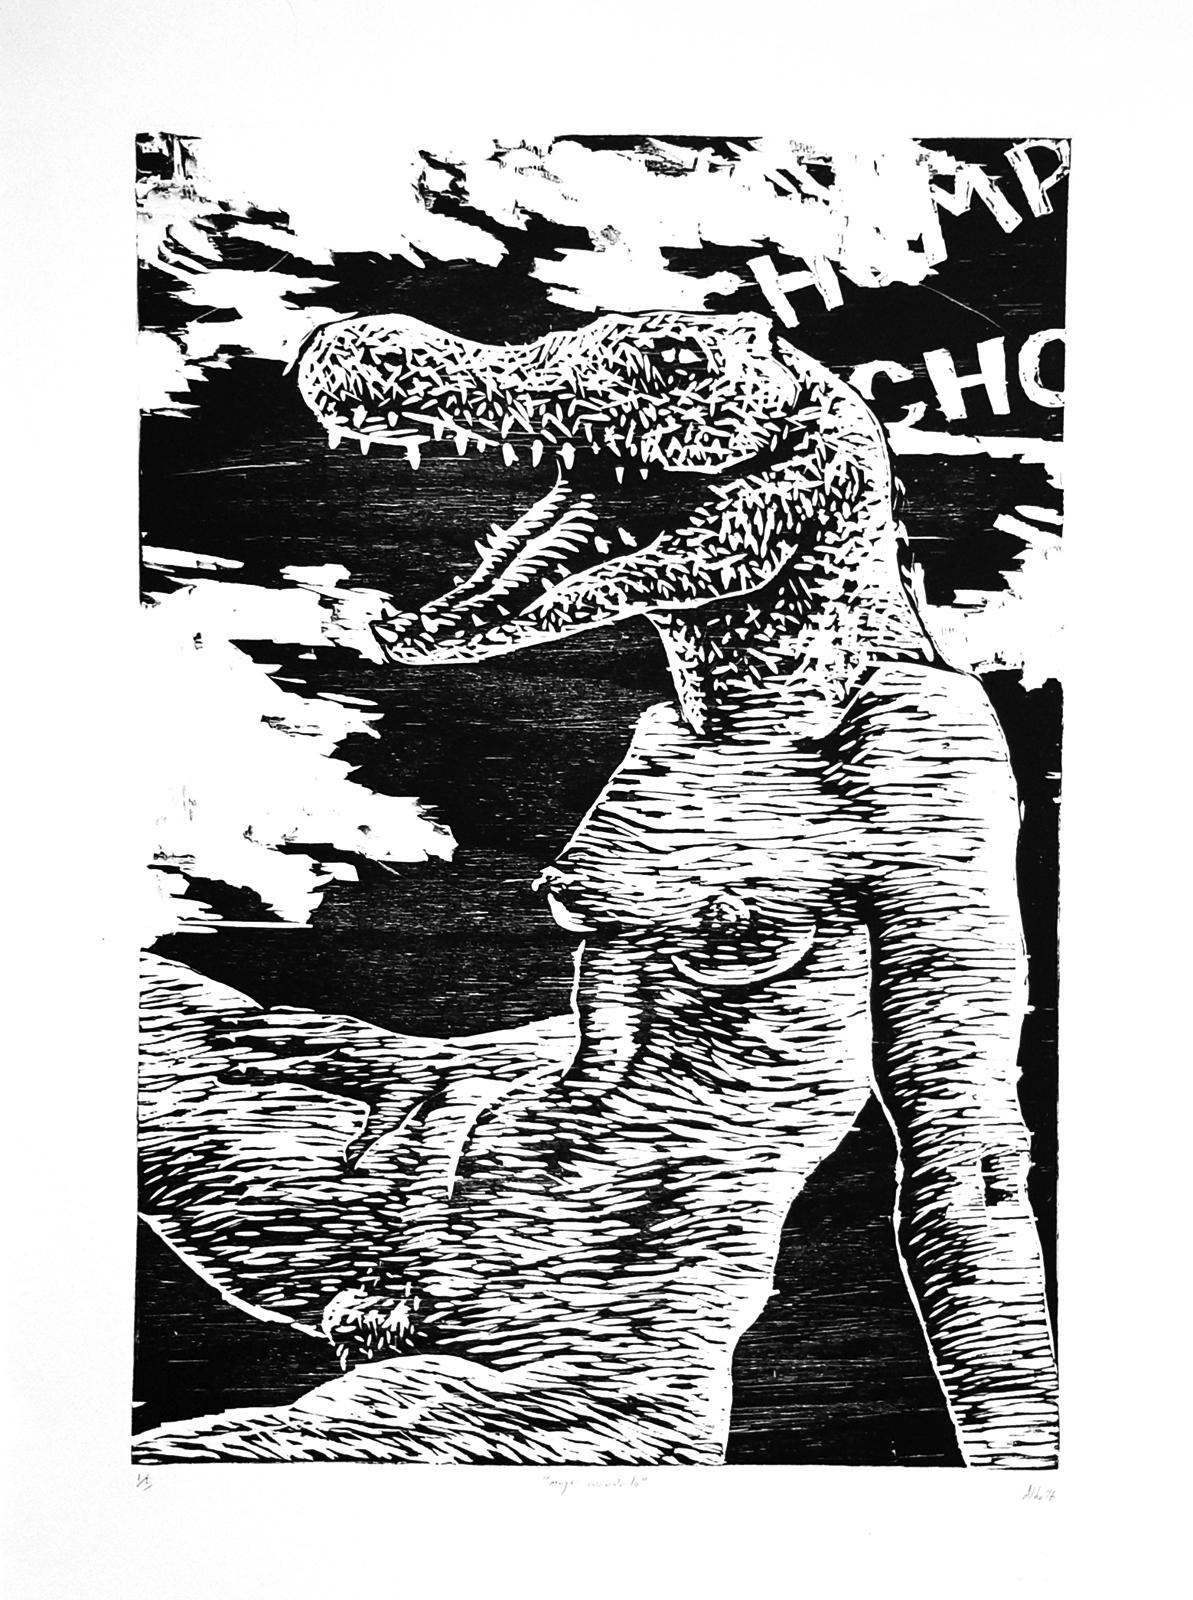 Mujer cocodrilo by maledictus